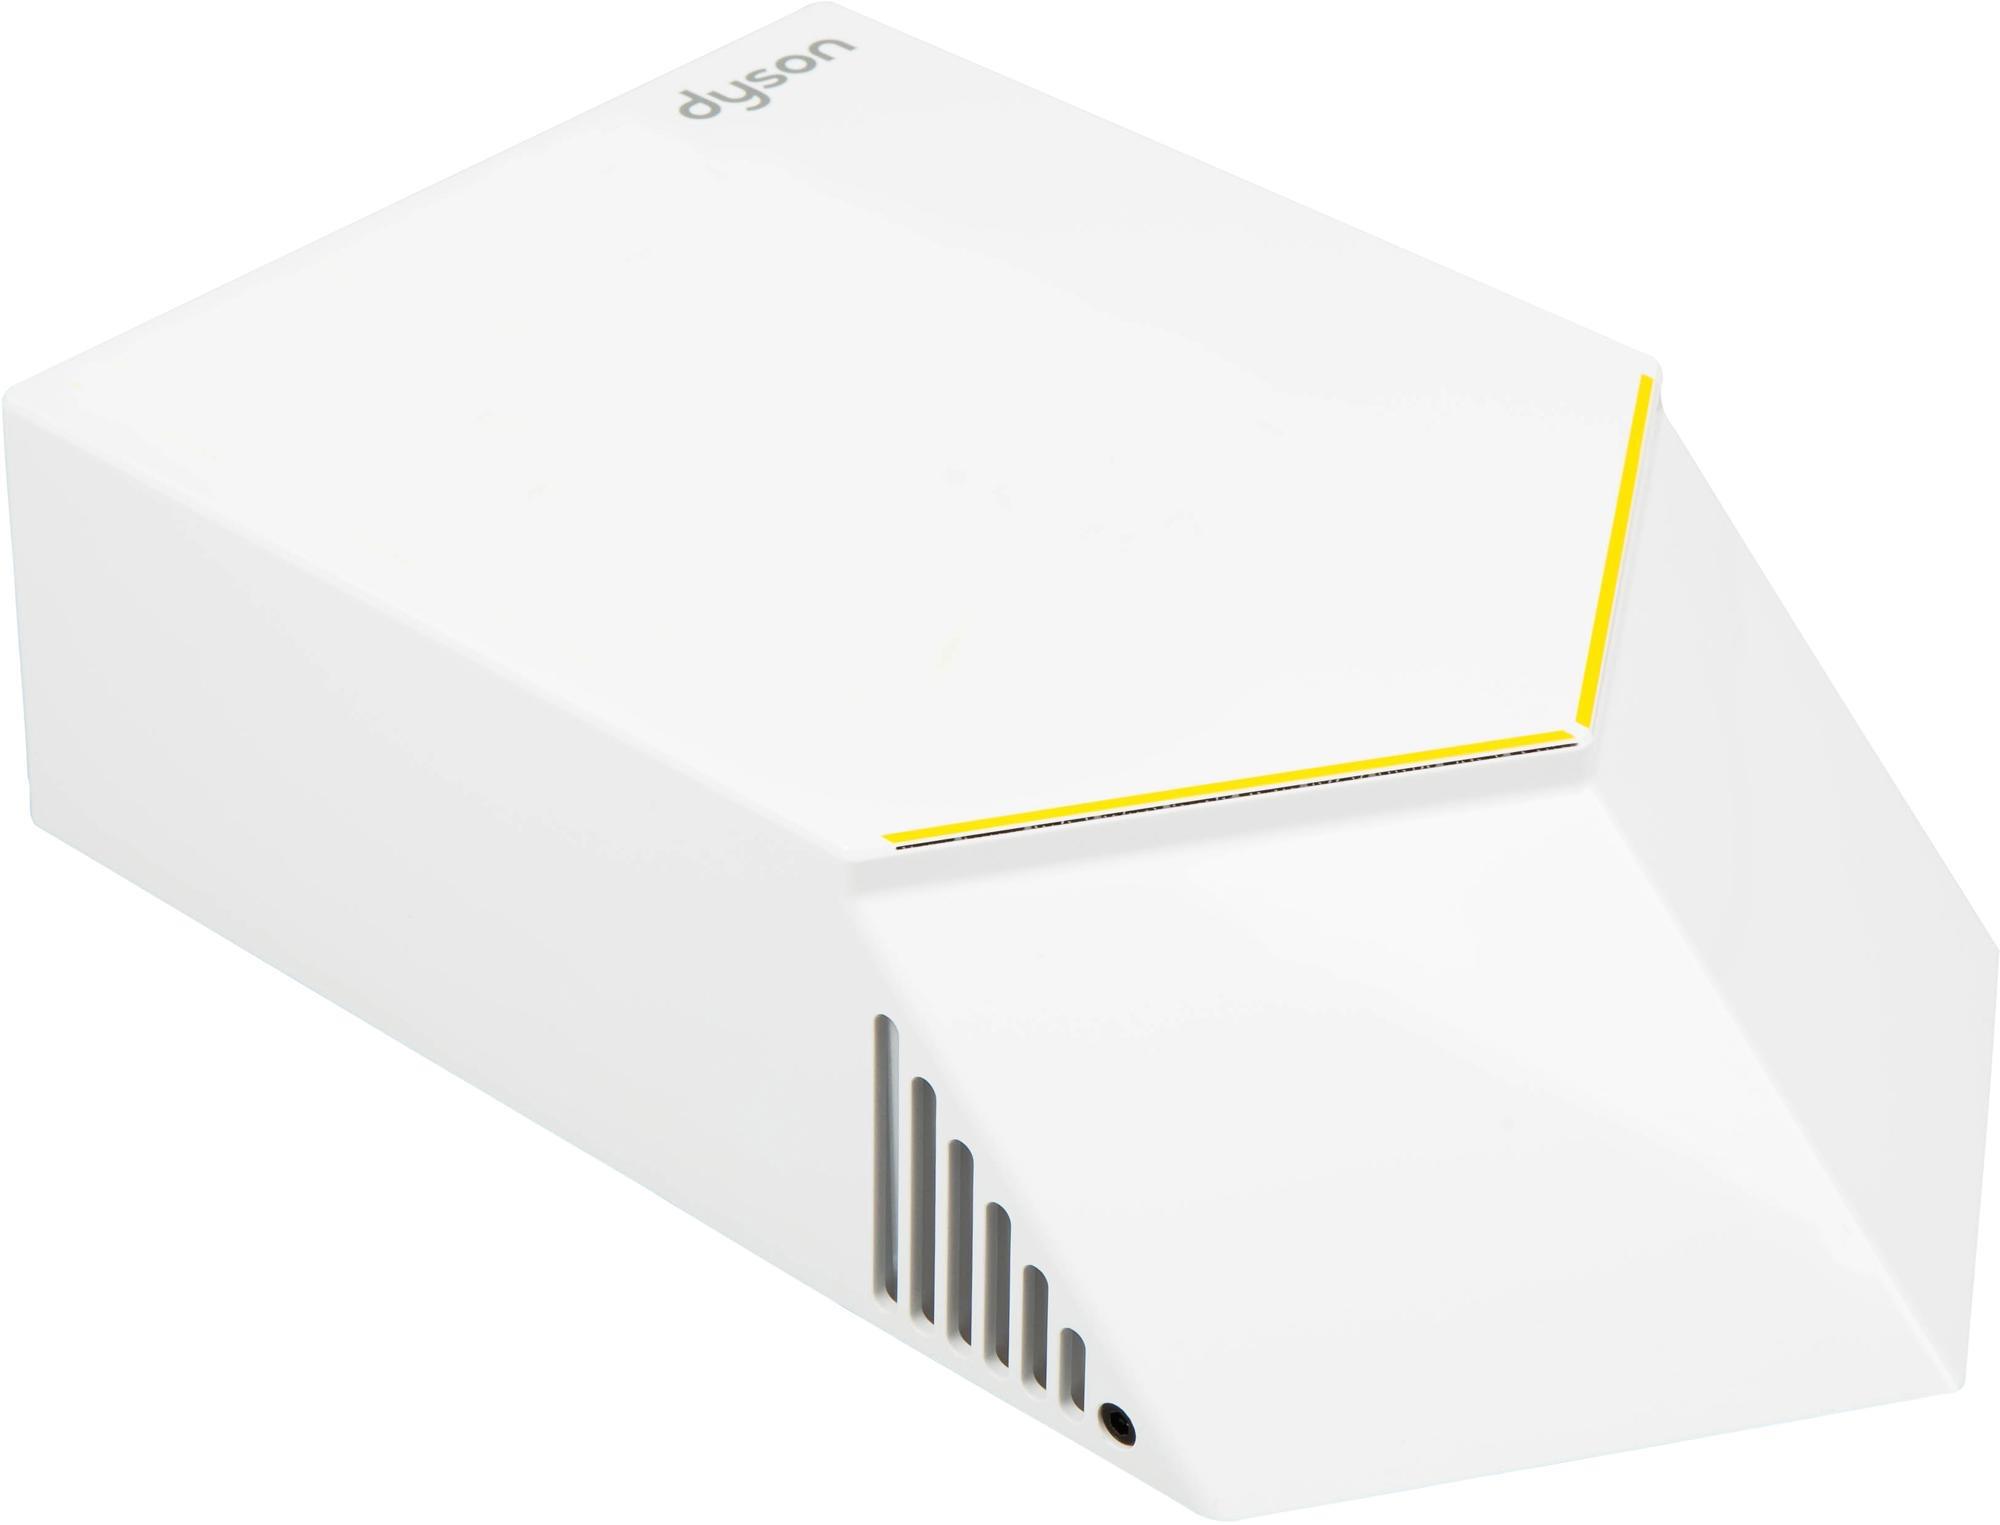 戴森dyson airblade v干手机烘手器AB08 AB12 HU02国内现货